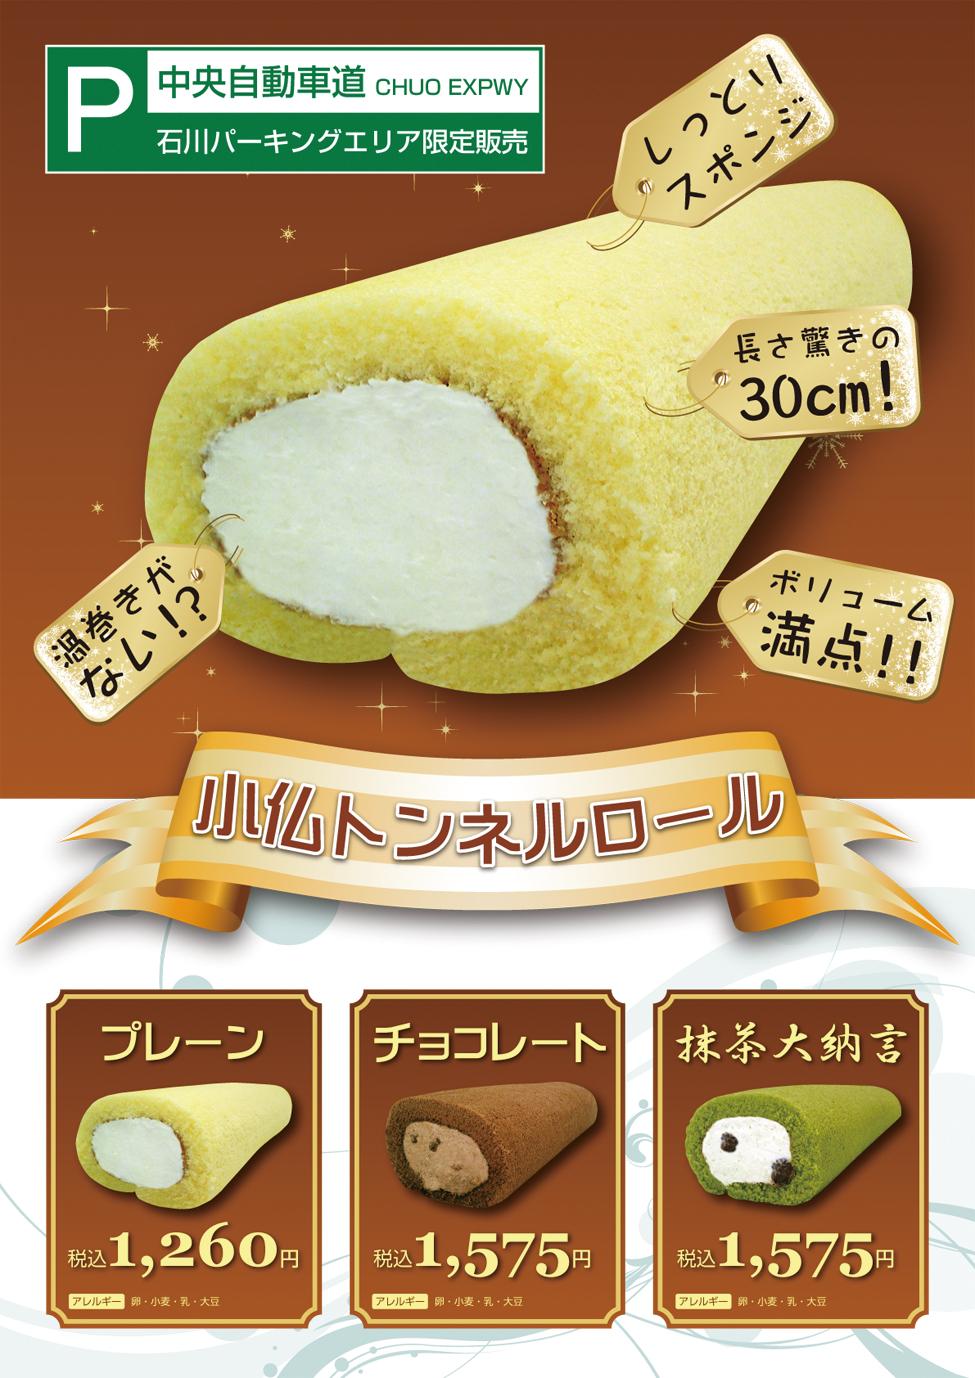 横浜市食品流通会社様 | A2(420×594mm)ポスター